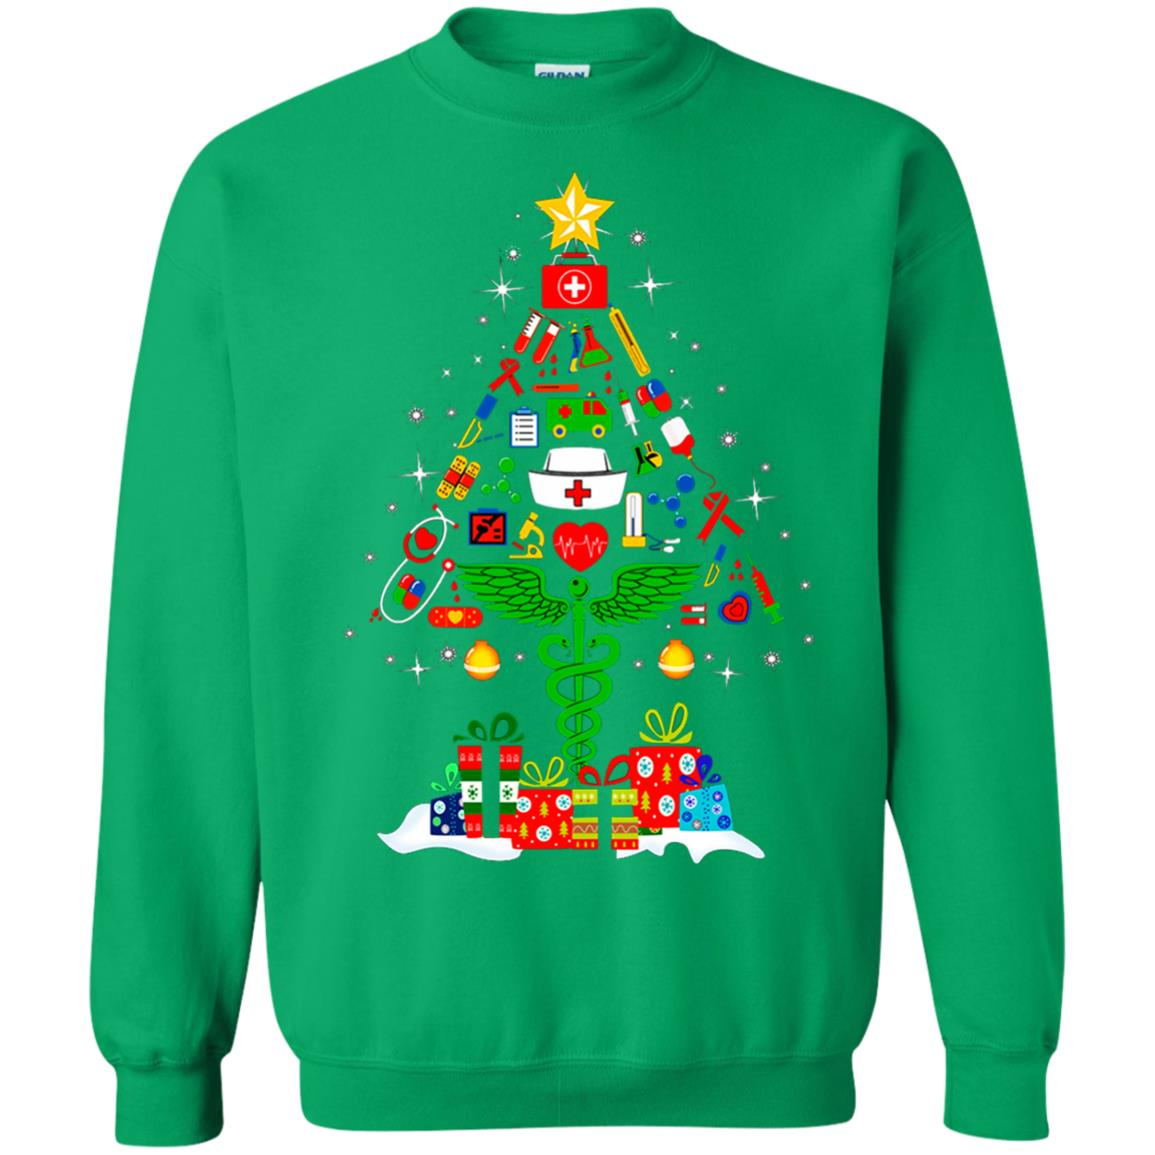 image 100 - Nurse Christmas Tree sweater, hoodie, long sleeve